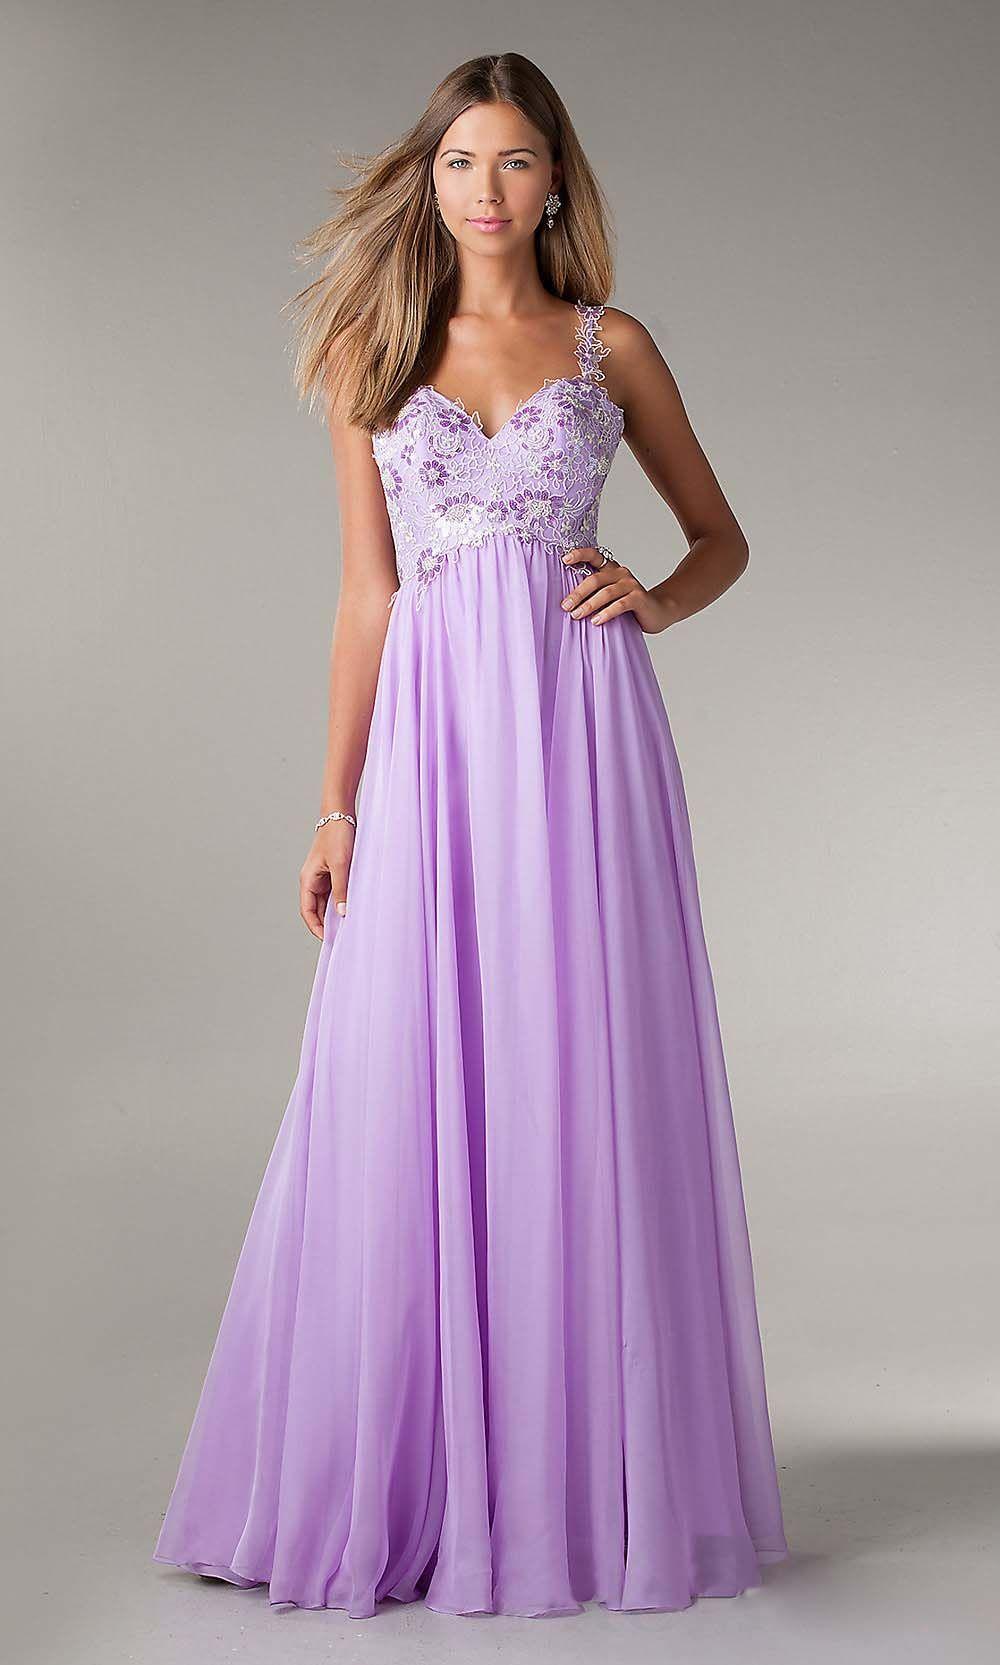 beautiful prom dress | Things I love❤ | Pinterest | Lavender prom ...